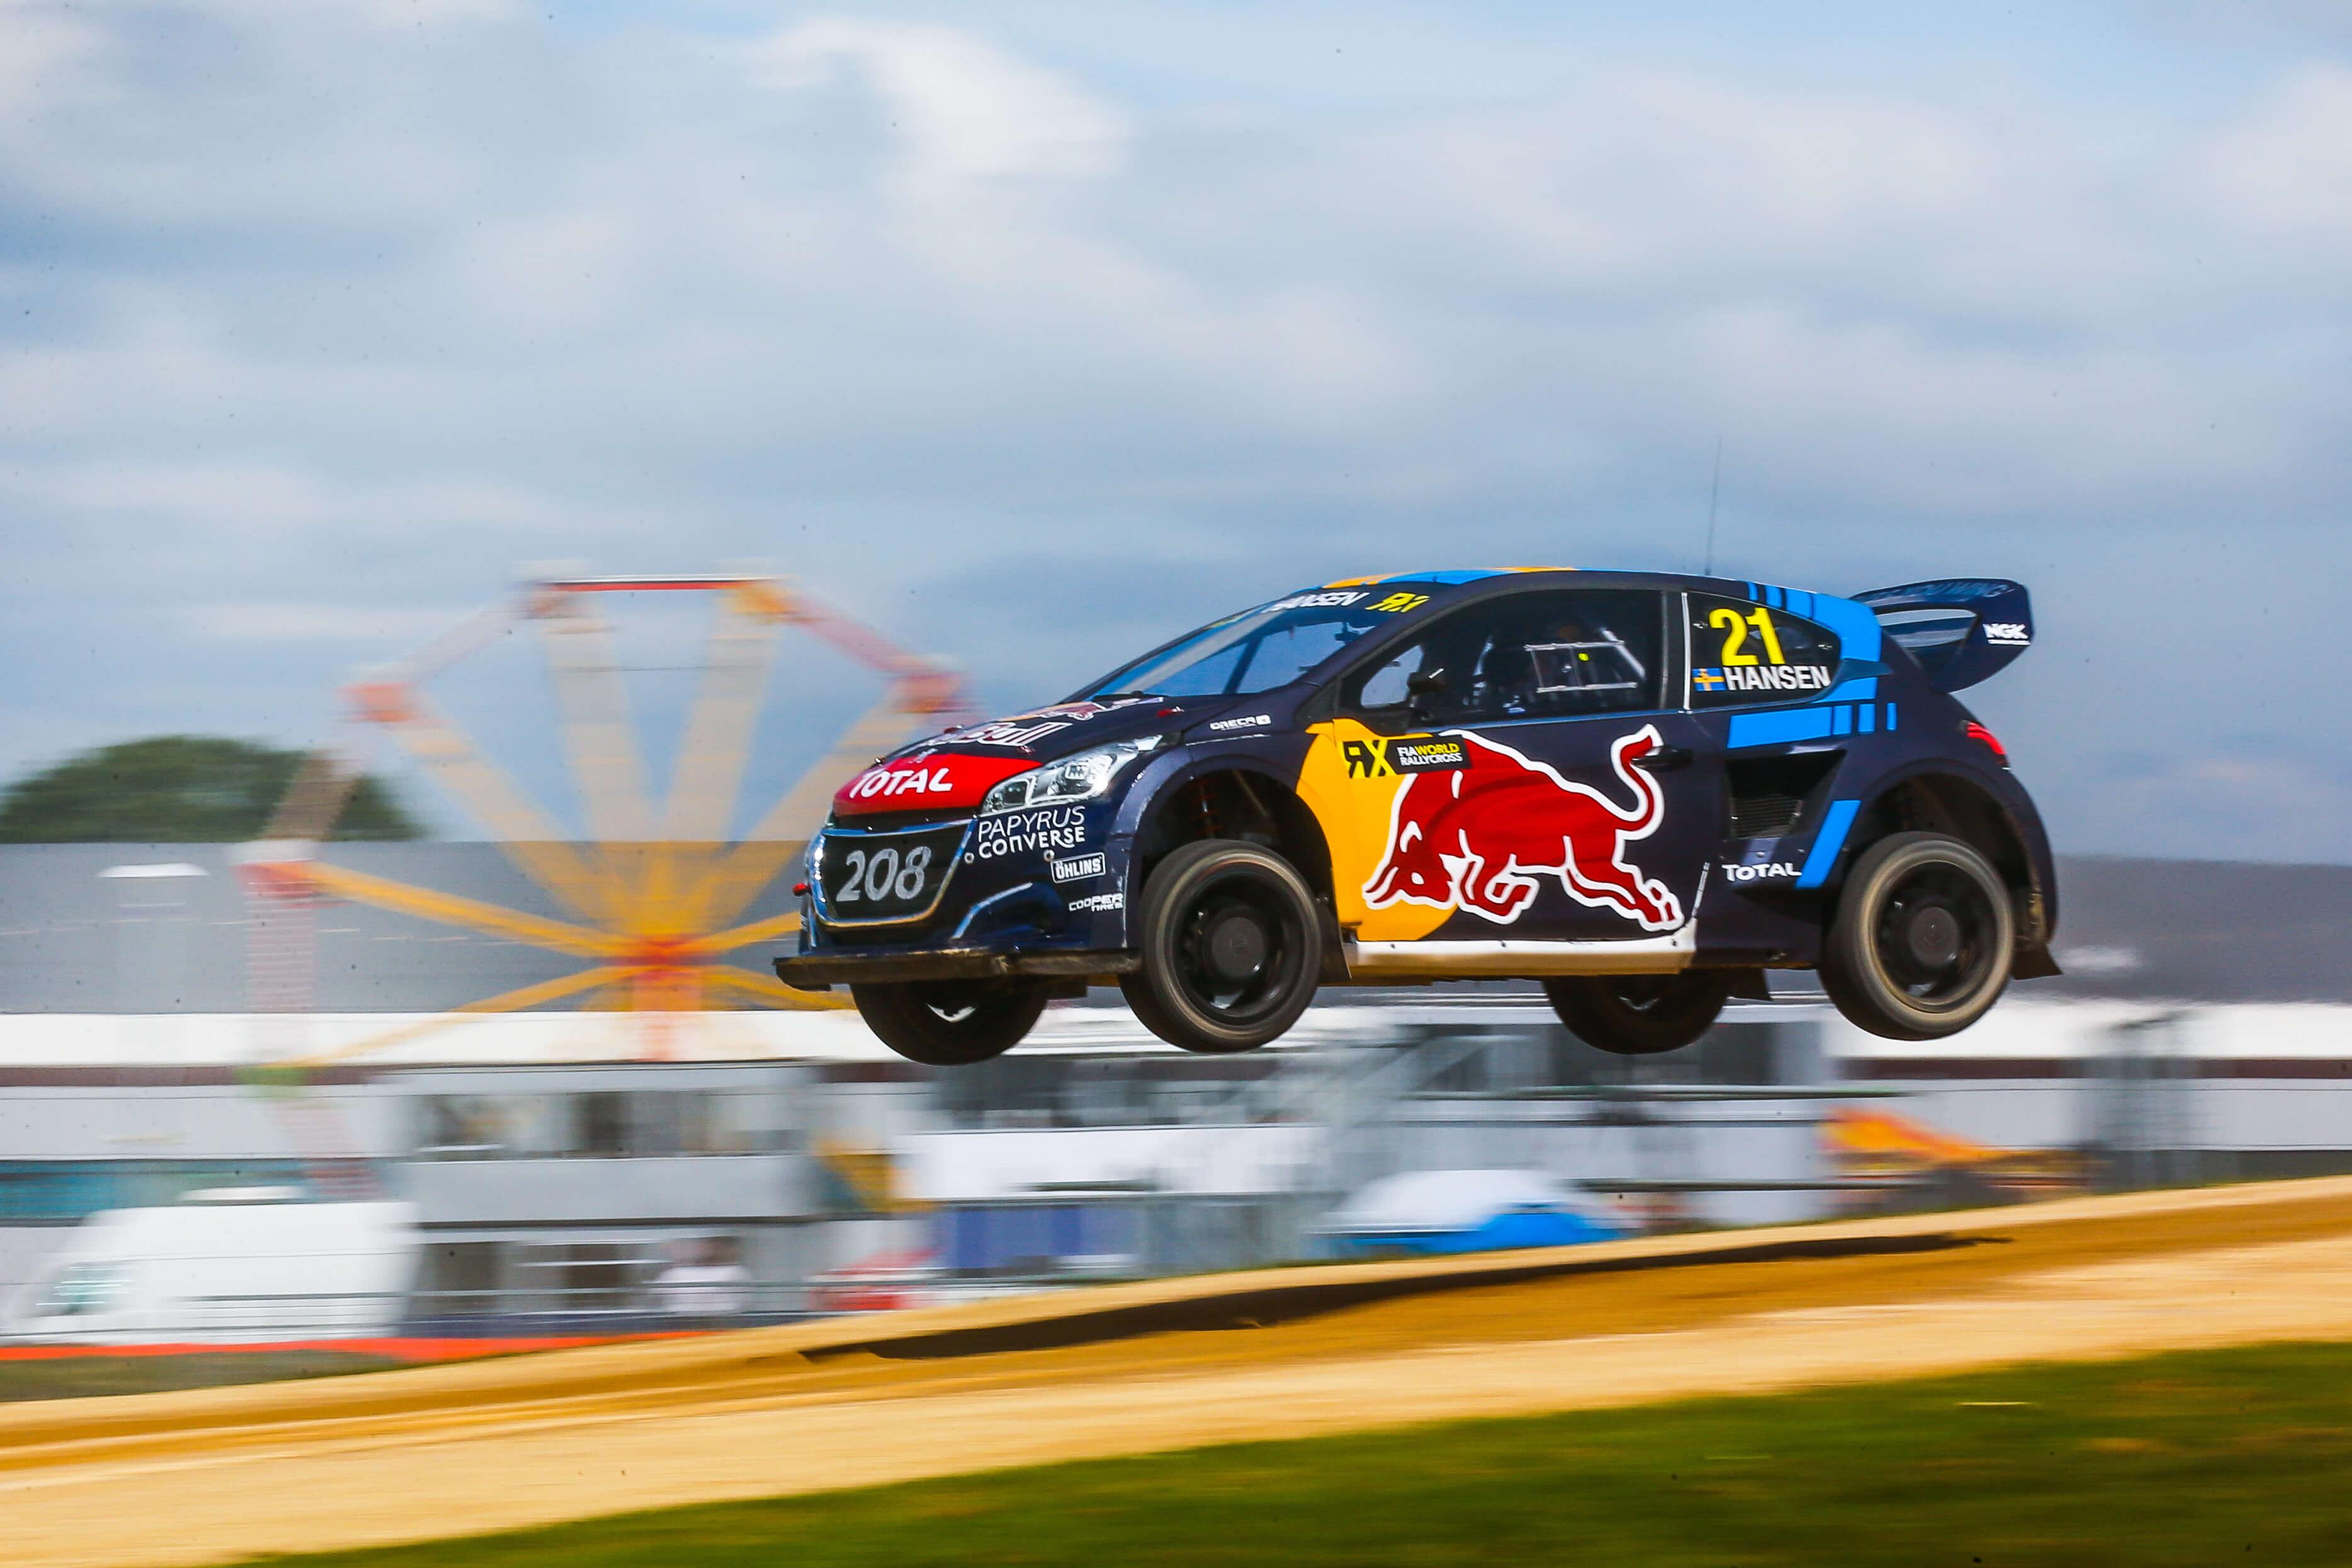 World RX 2019 | Silverstone Festival